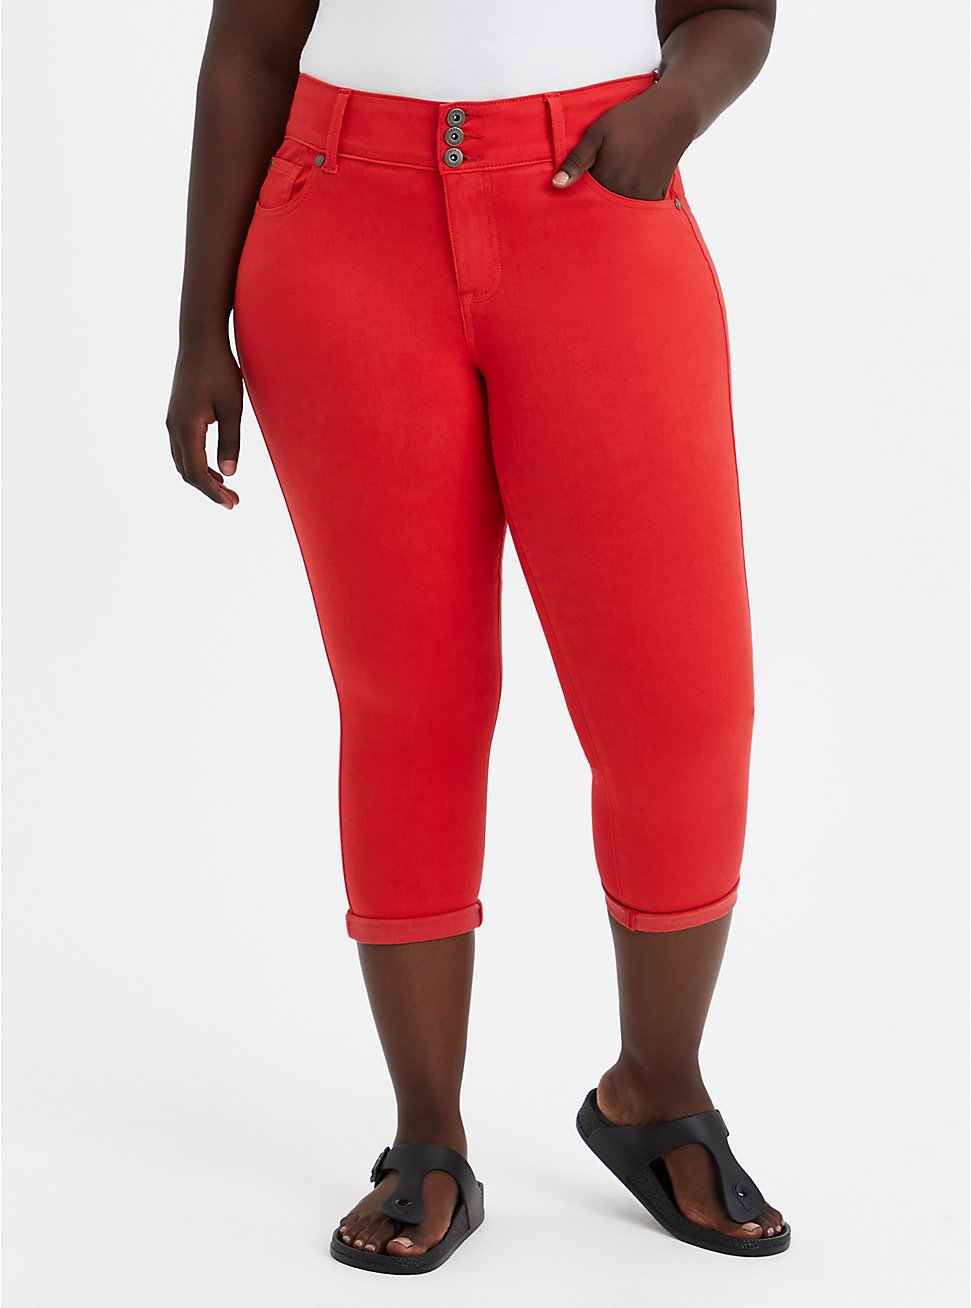 Plus Size Crop Jegging - Super Soft Red, , fitModel1-hires